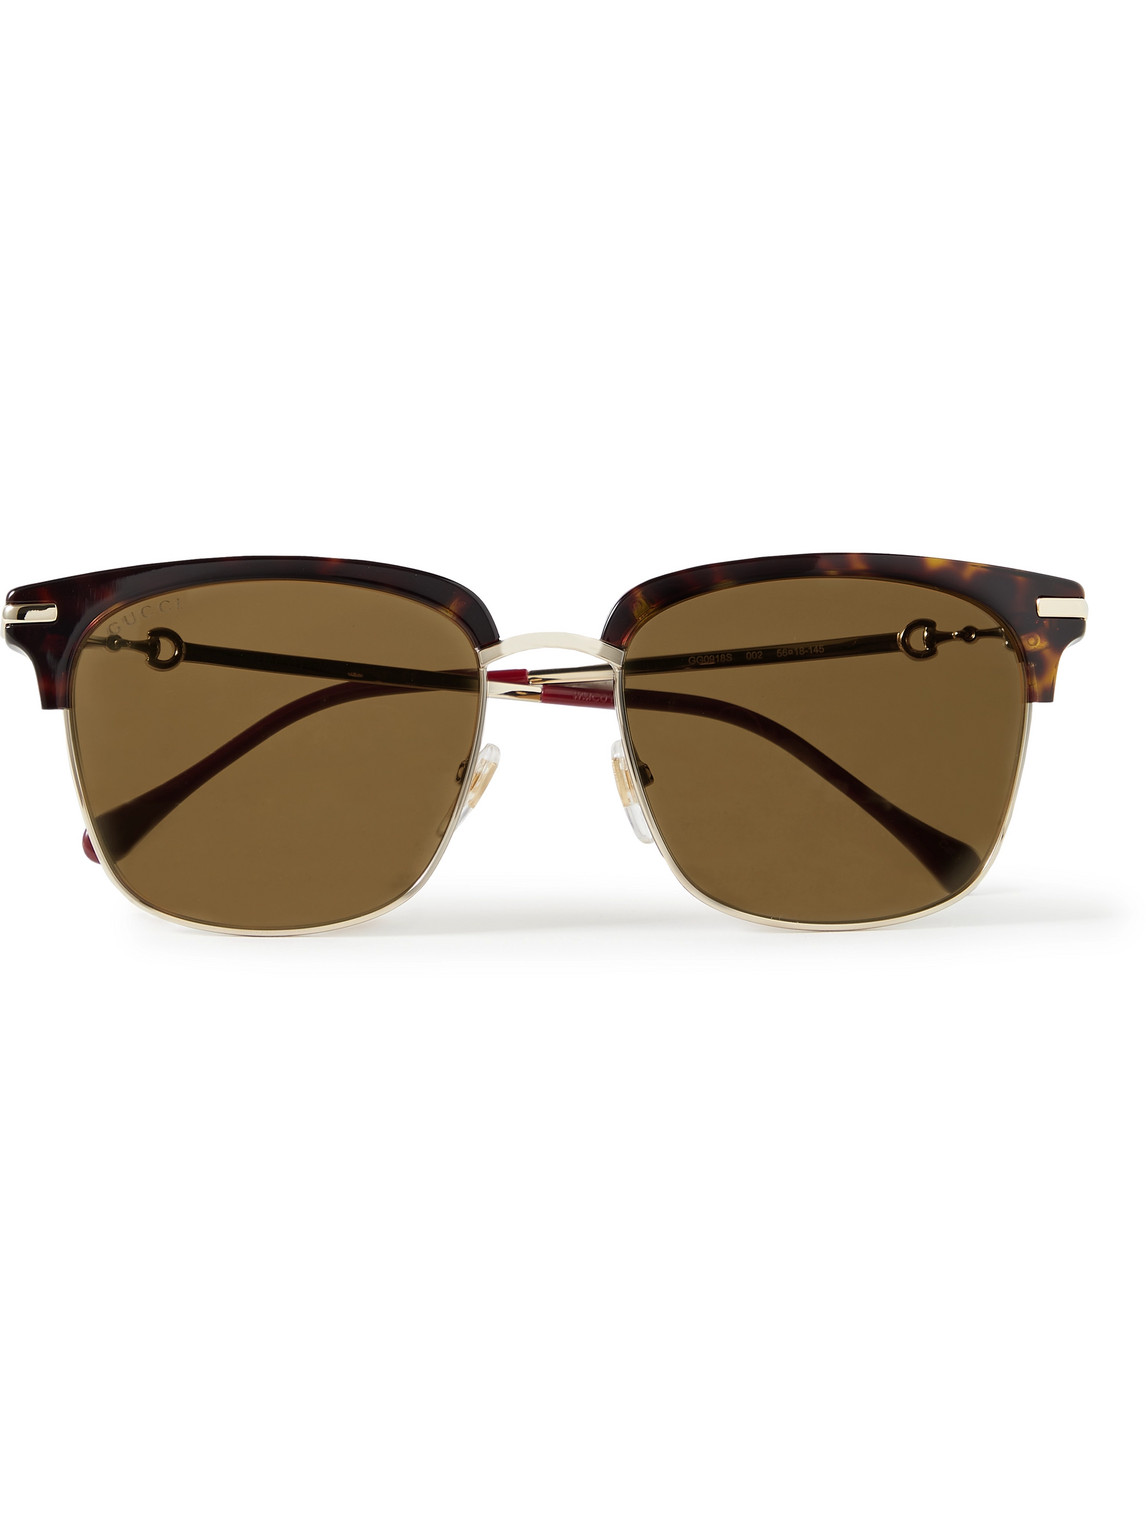 Gucci - D-Frame Tortoiseshell Acetate And Gold-Tone Sunglasses - Men - Tortoiseshell